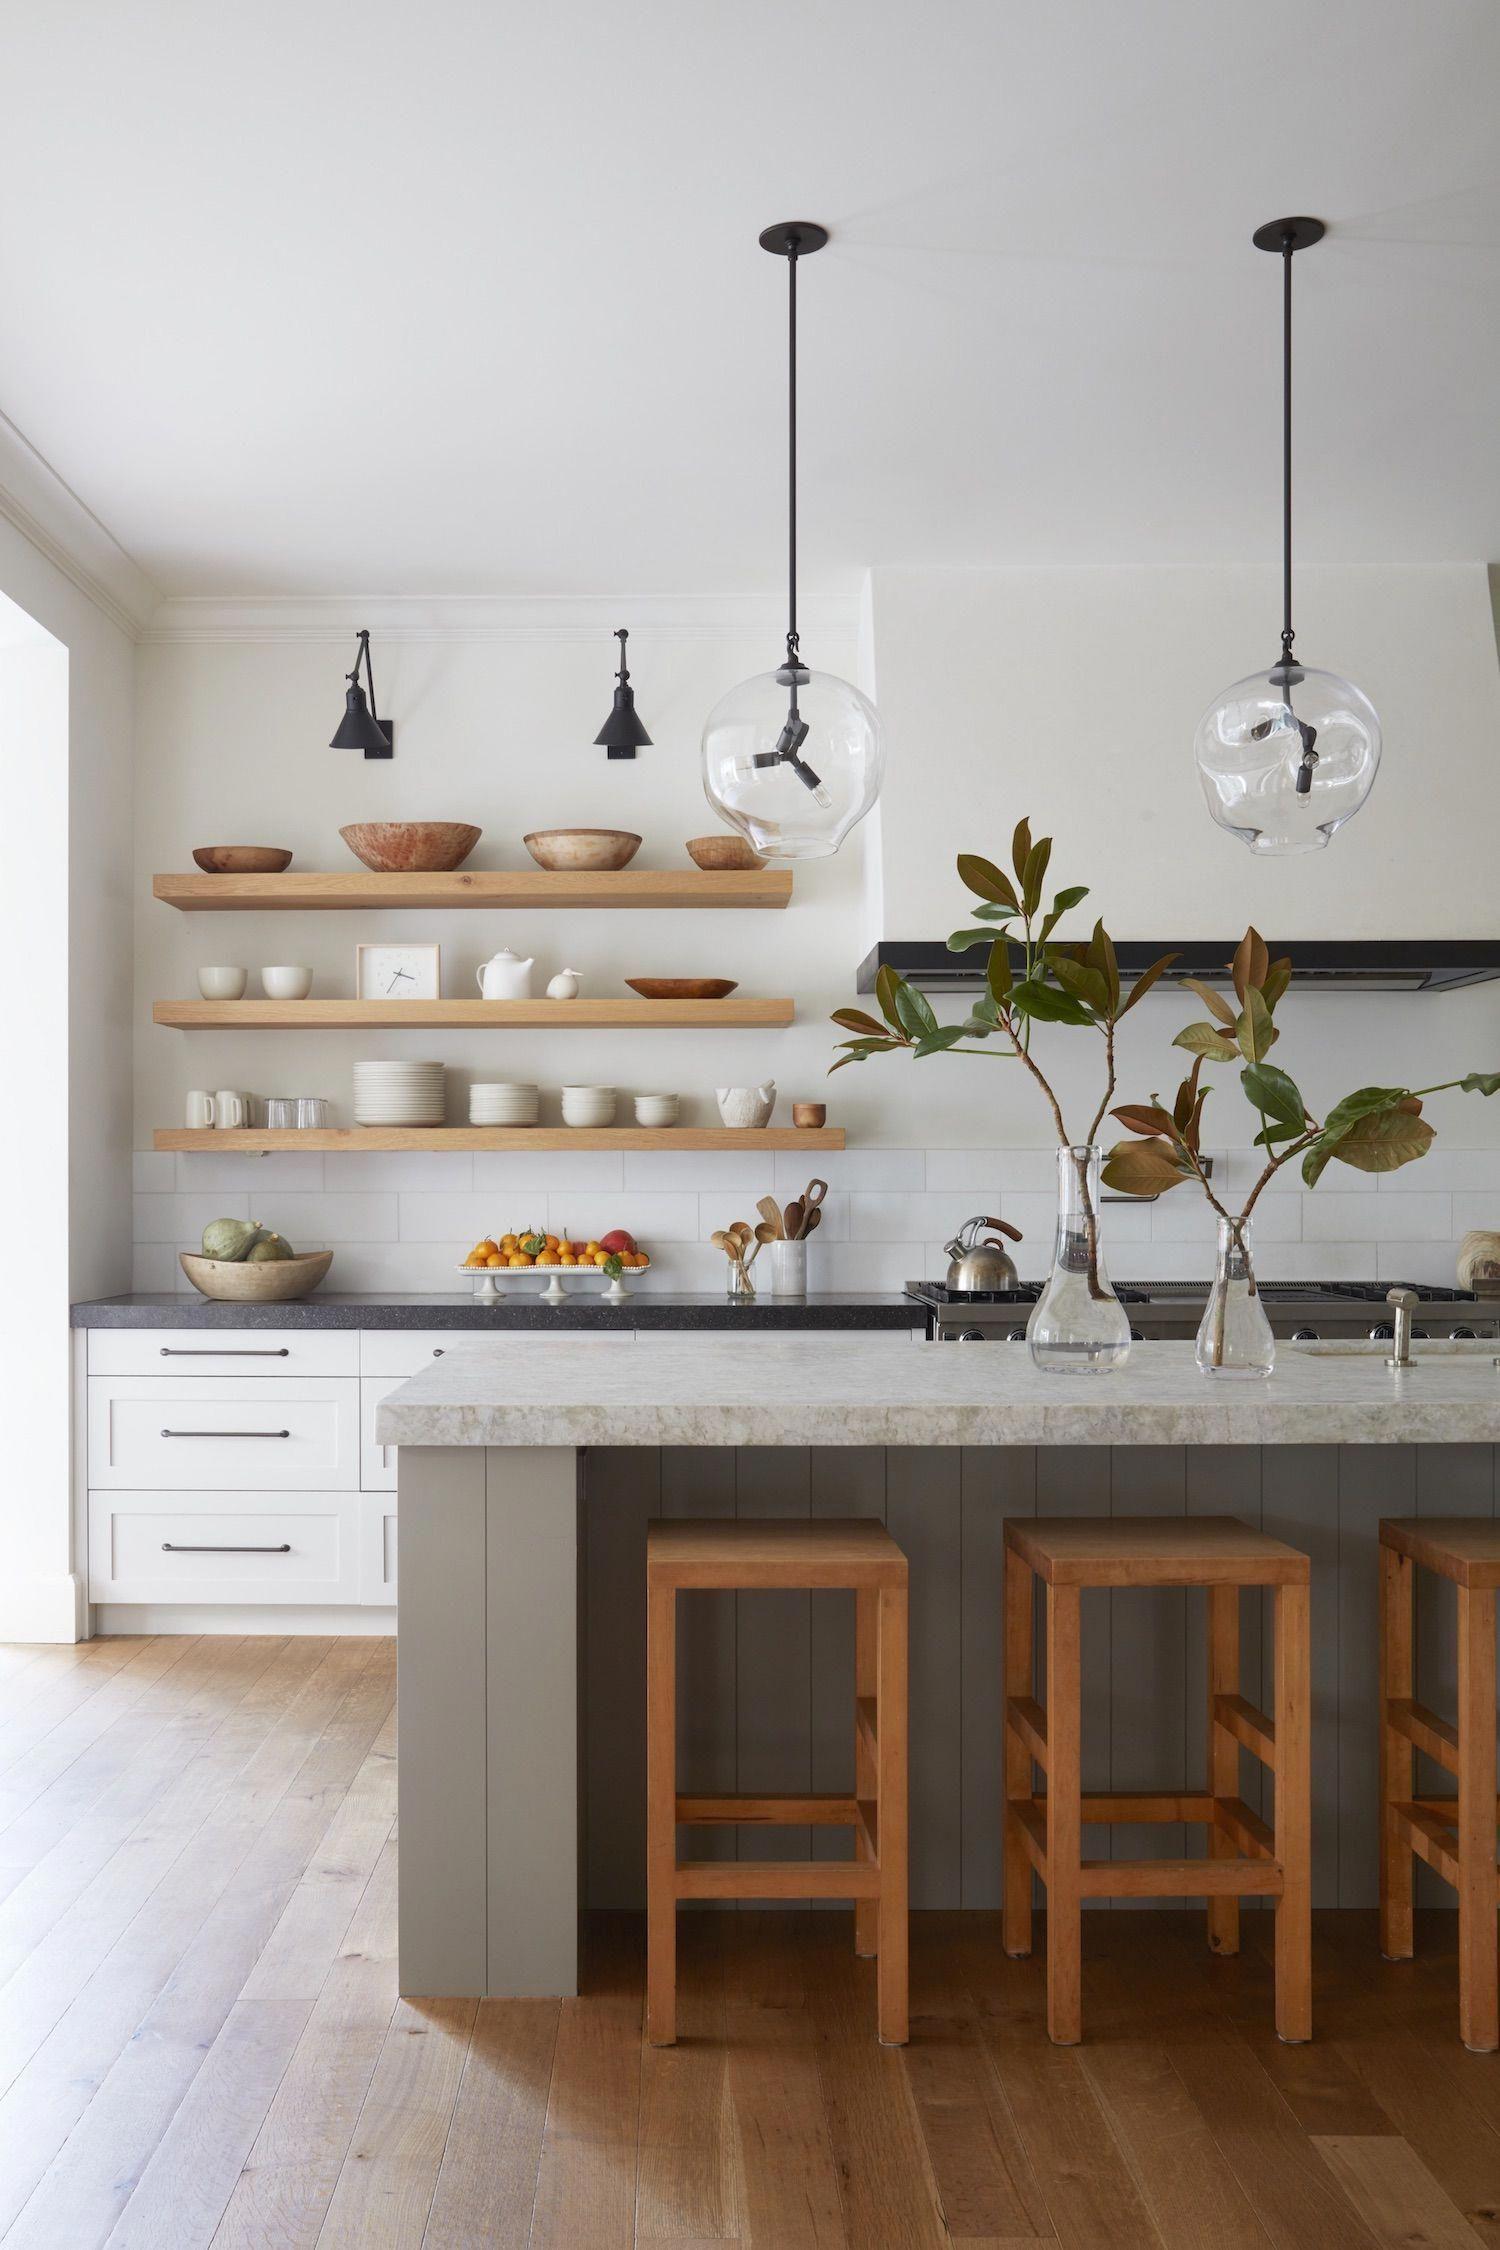 Color palette overall simplicity m elle design brentwood revival california interior design firm carinteriornearme